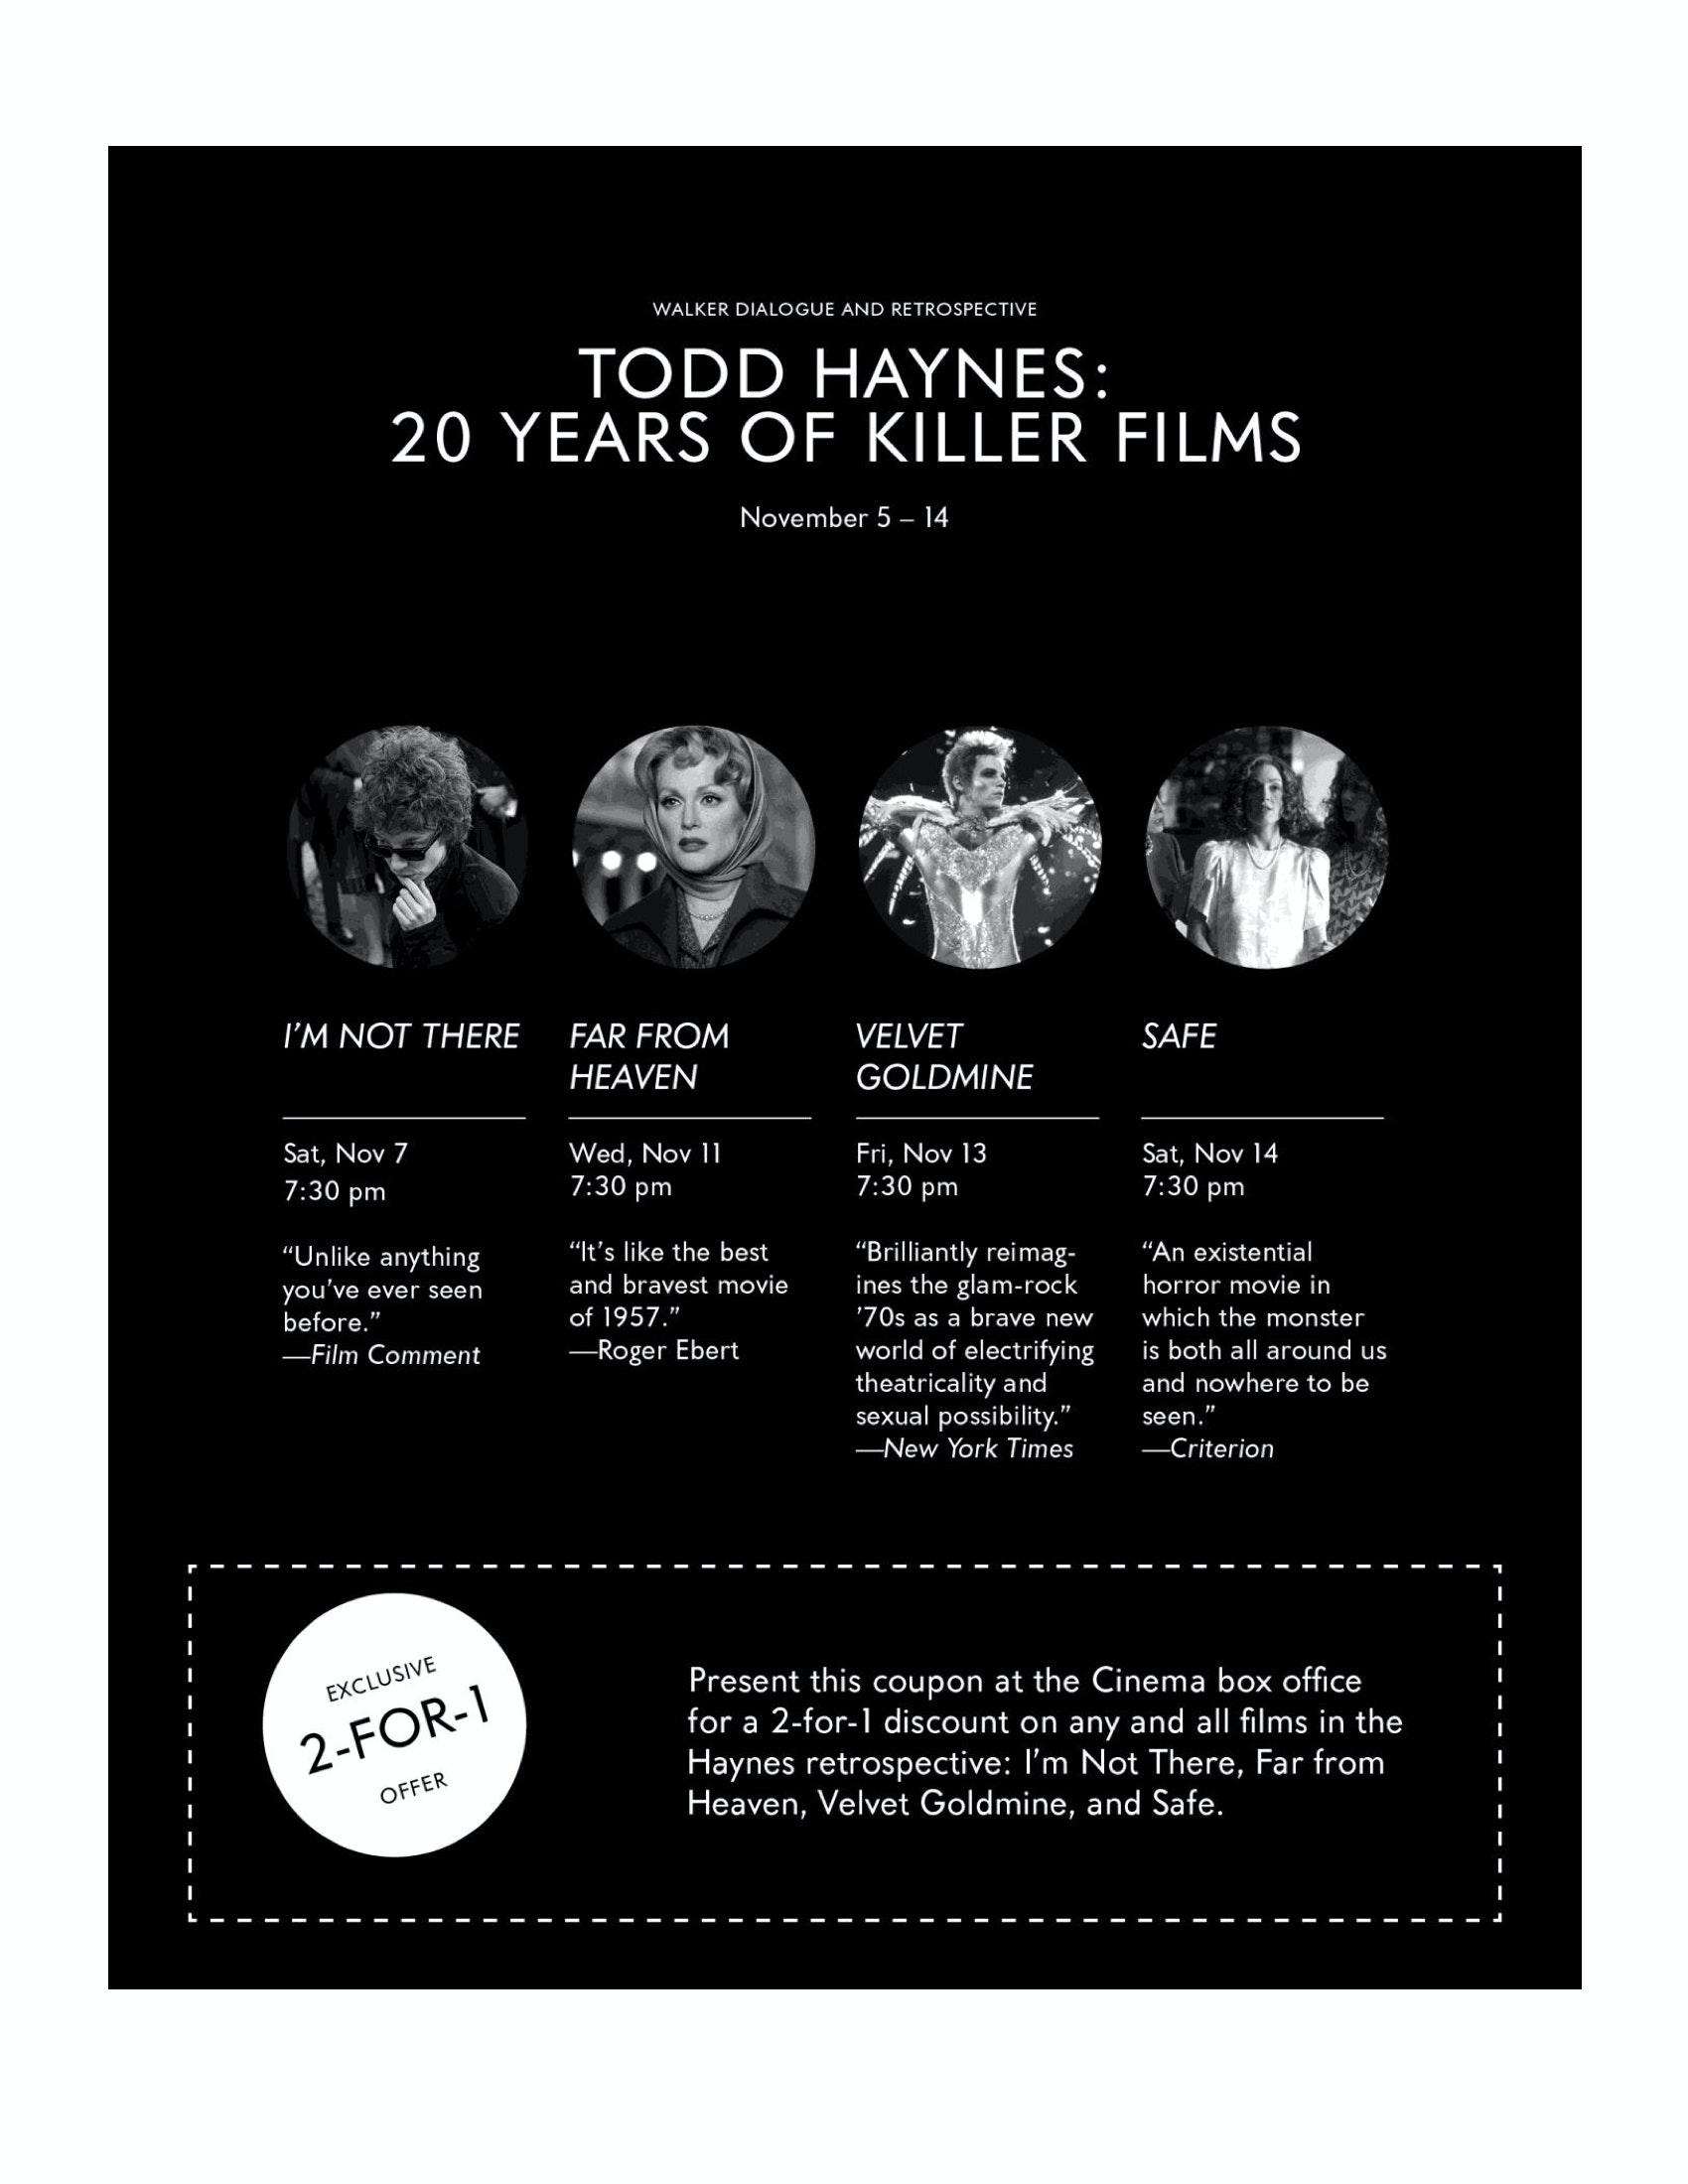 Todd Haynes Dialogues event program notes pg 2